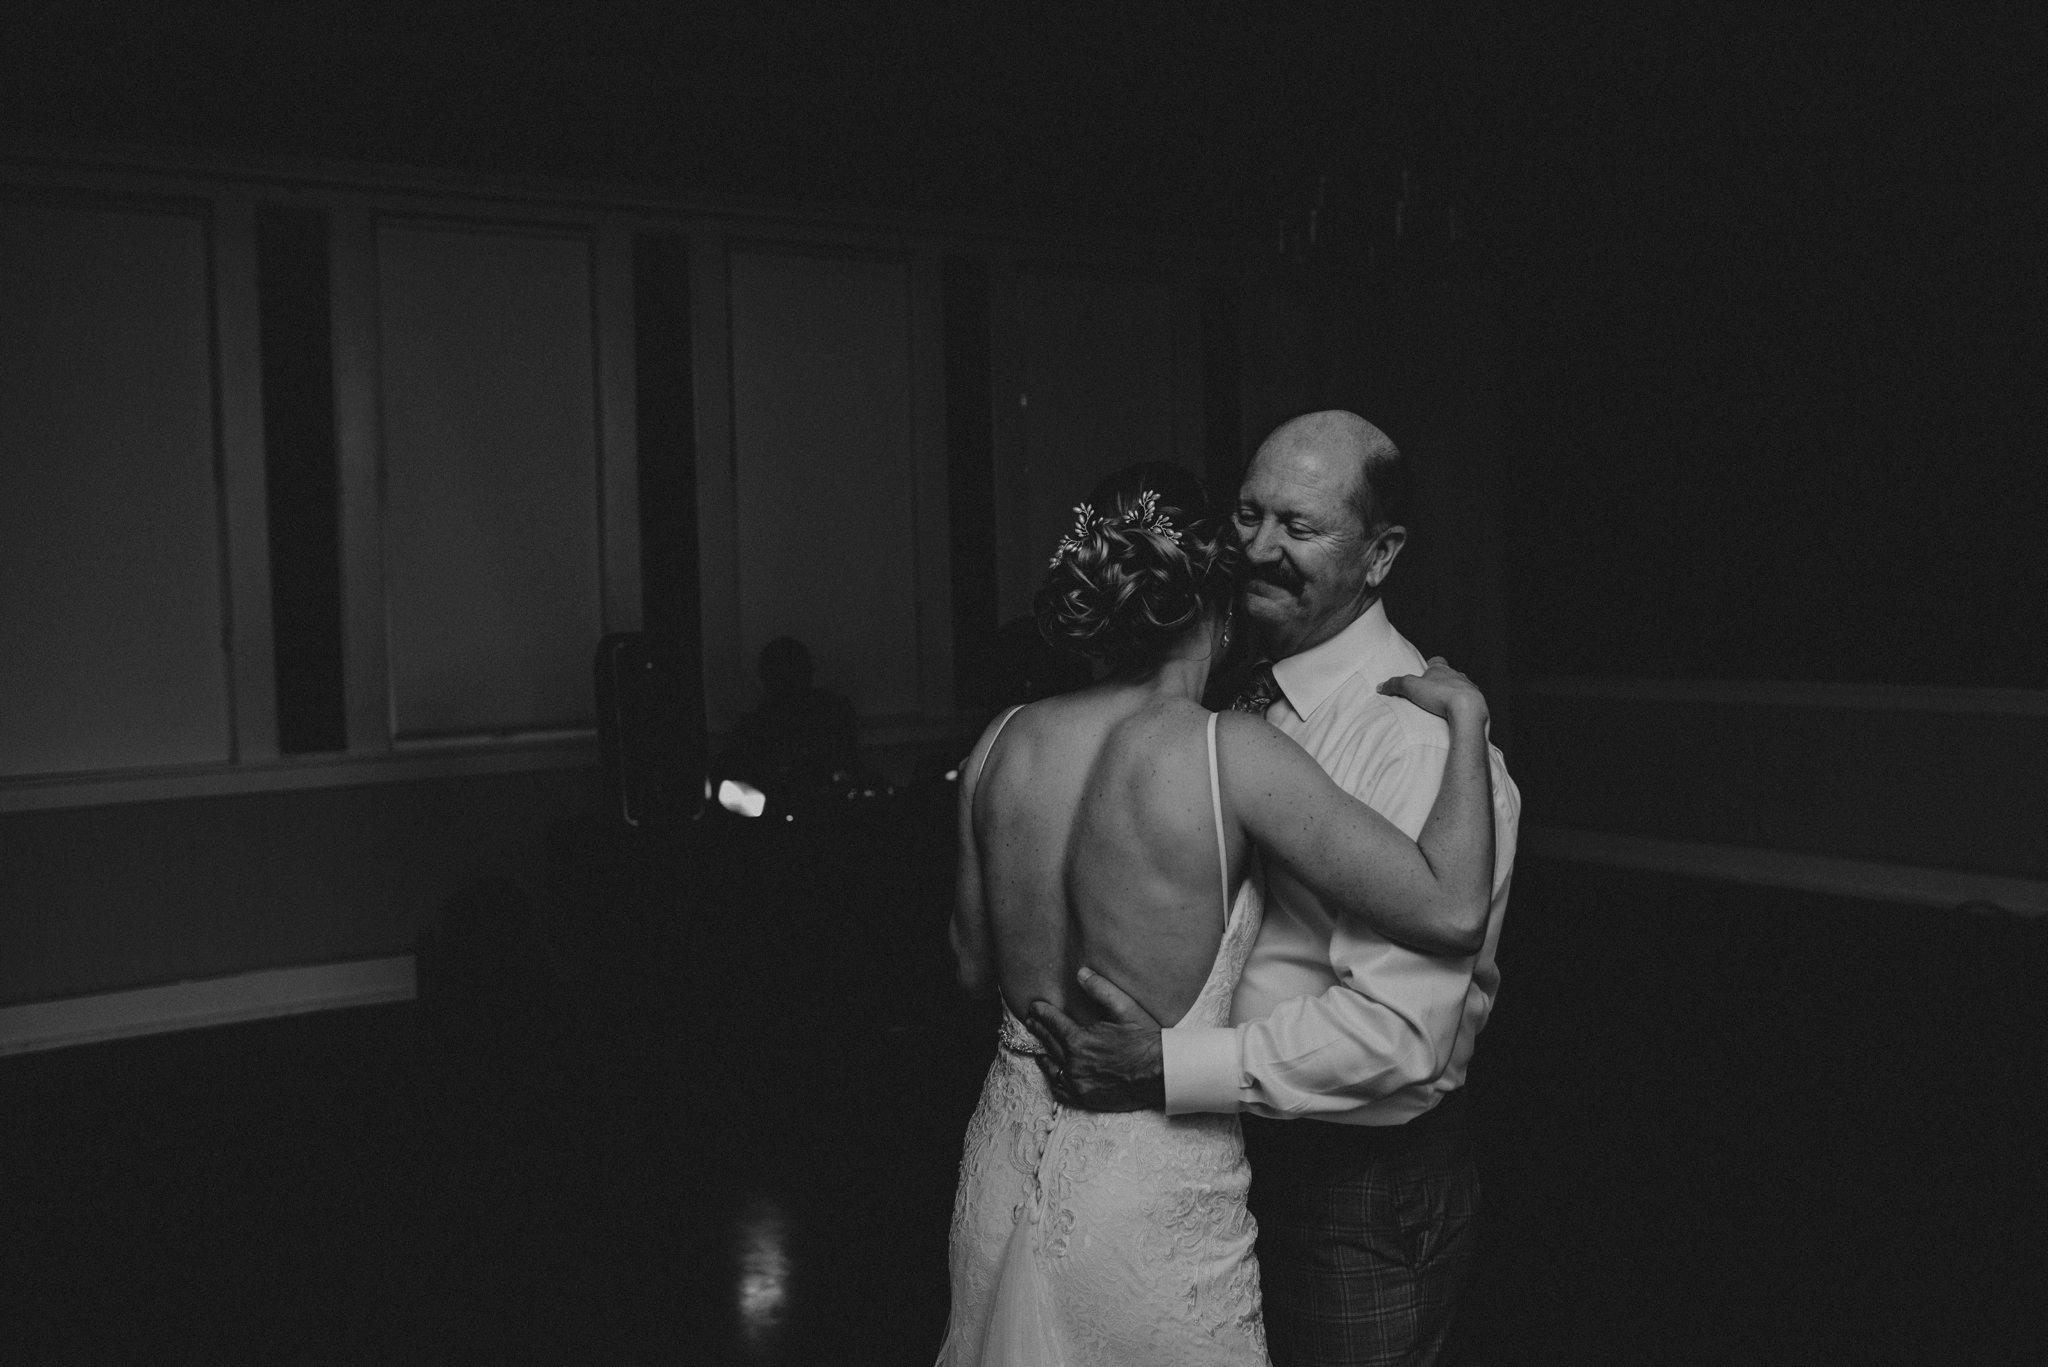 hollywood-school-house-wedding-seattle-photographer-caitlyn-nikula-115.jpg